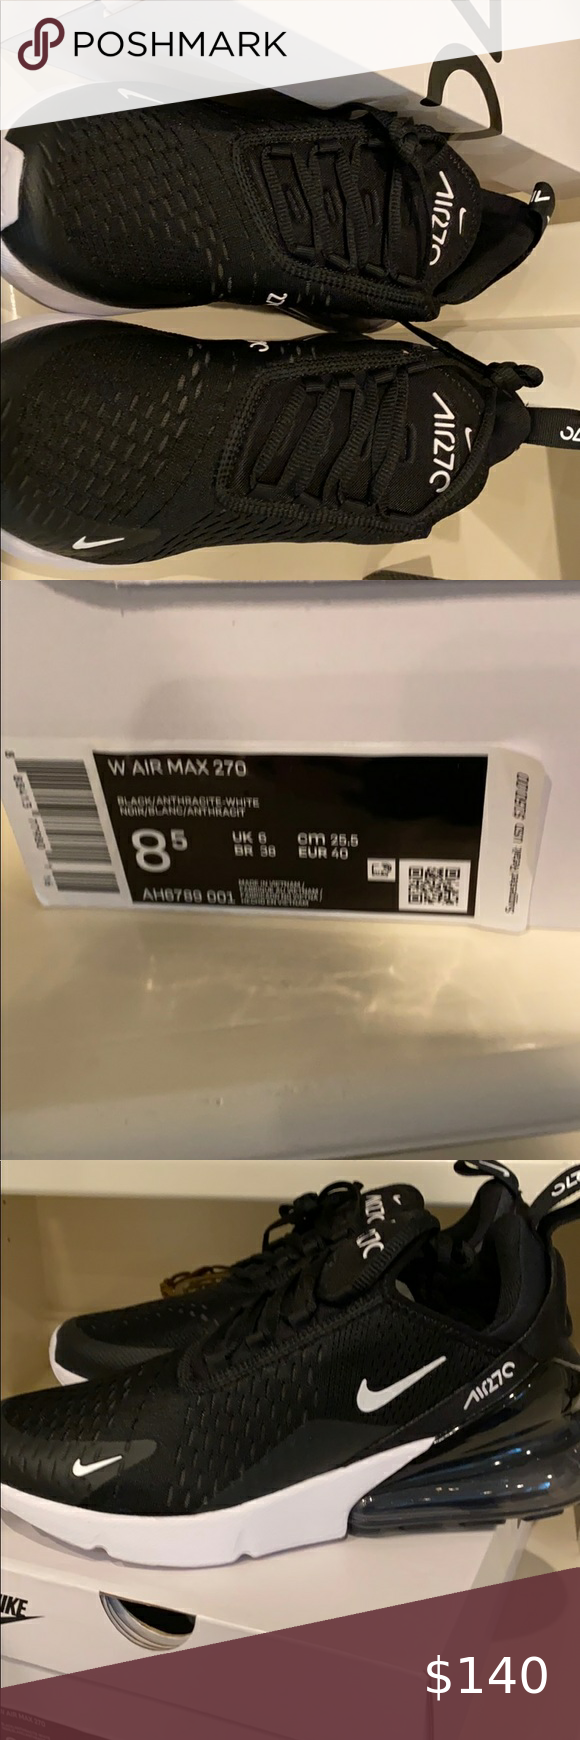 air max 260